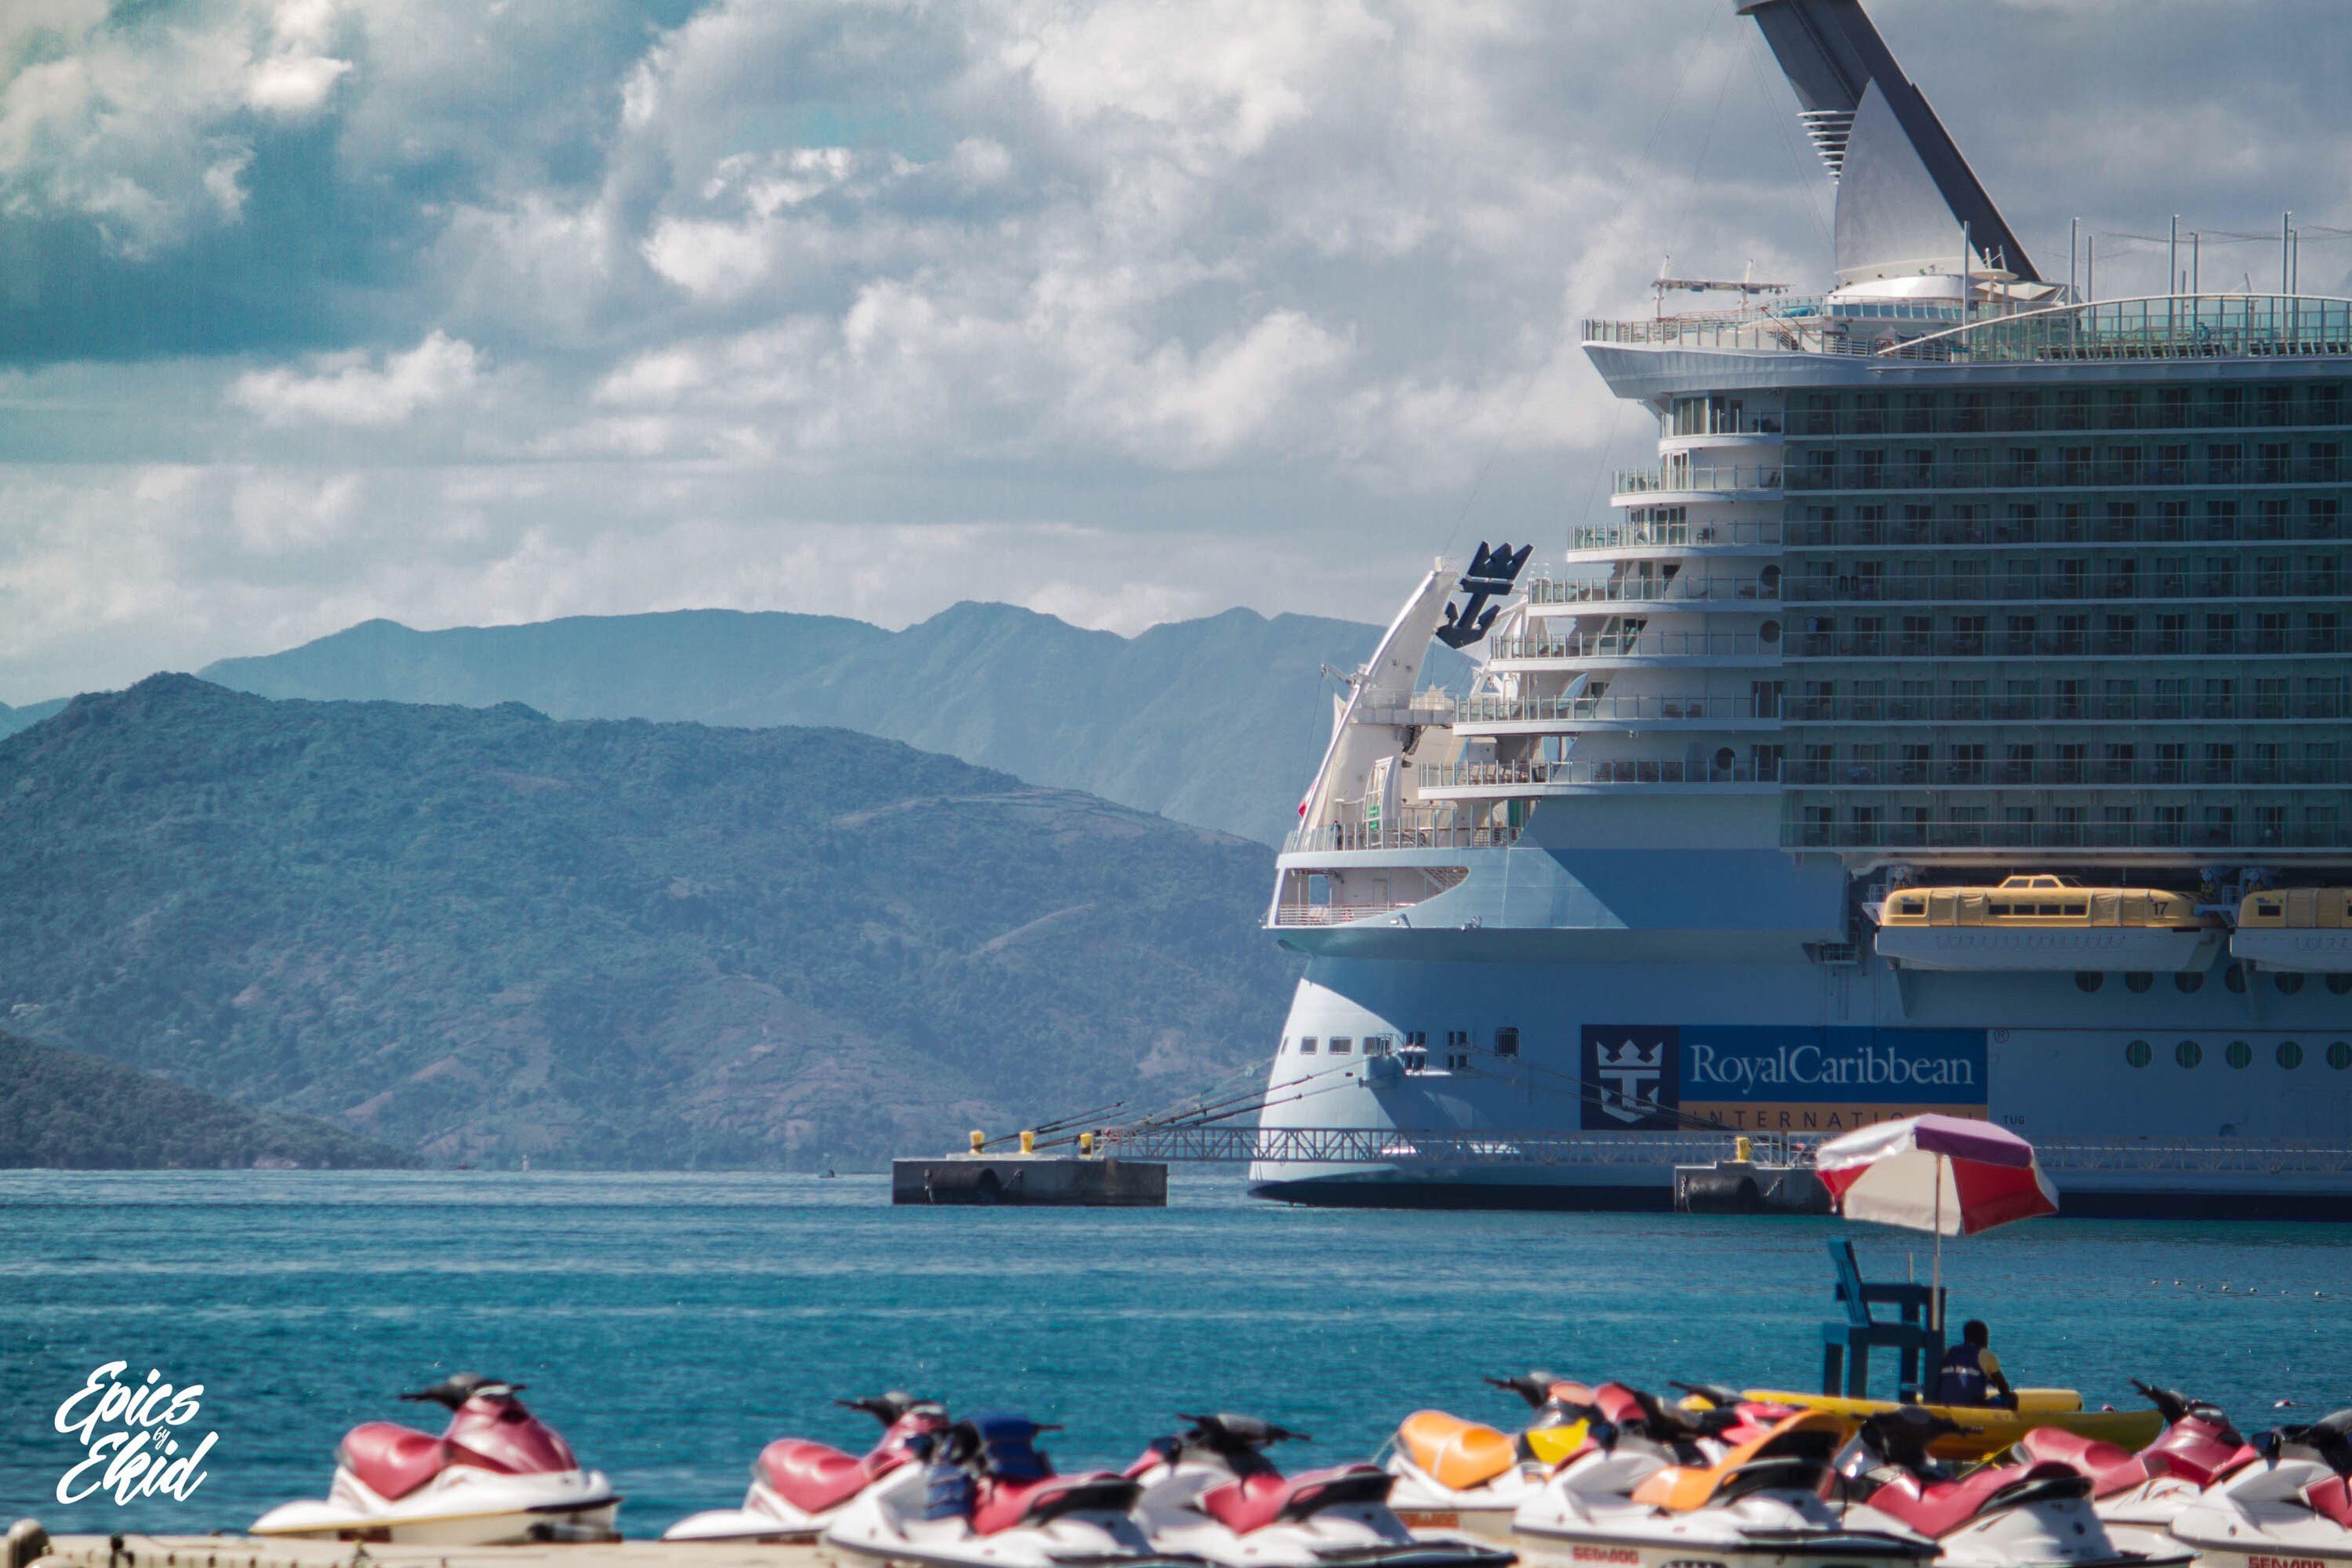 Oasis visits Haiti Oasisoftheseas RoyalCaribbean Haiti Cruise Cruiseship Travel Vacation Holiday Traveling Wander Bay Stern Clouds Bluewater Epicsbyekid Ekid Canon7d